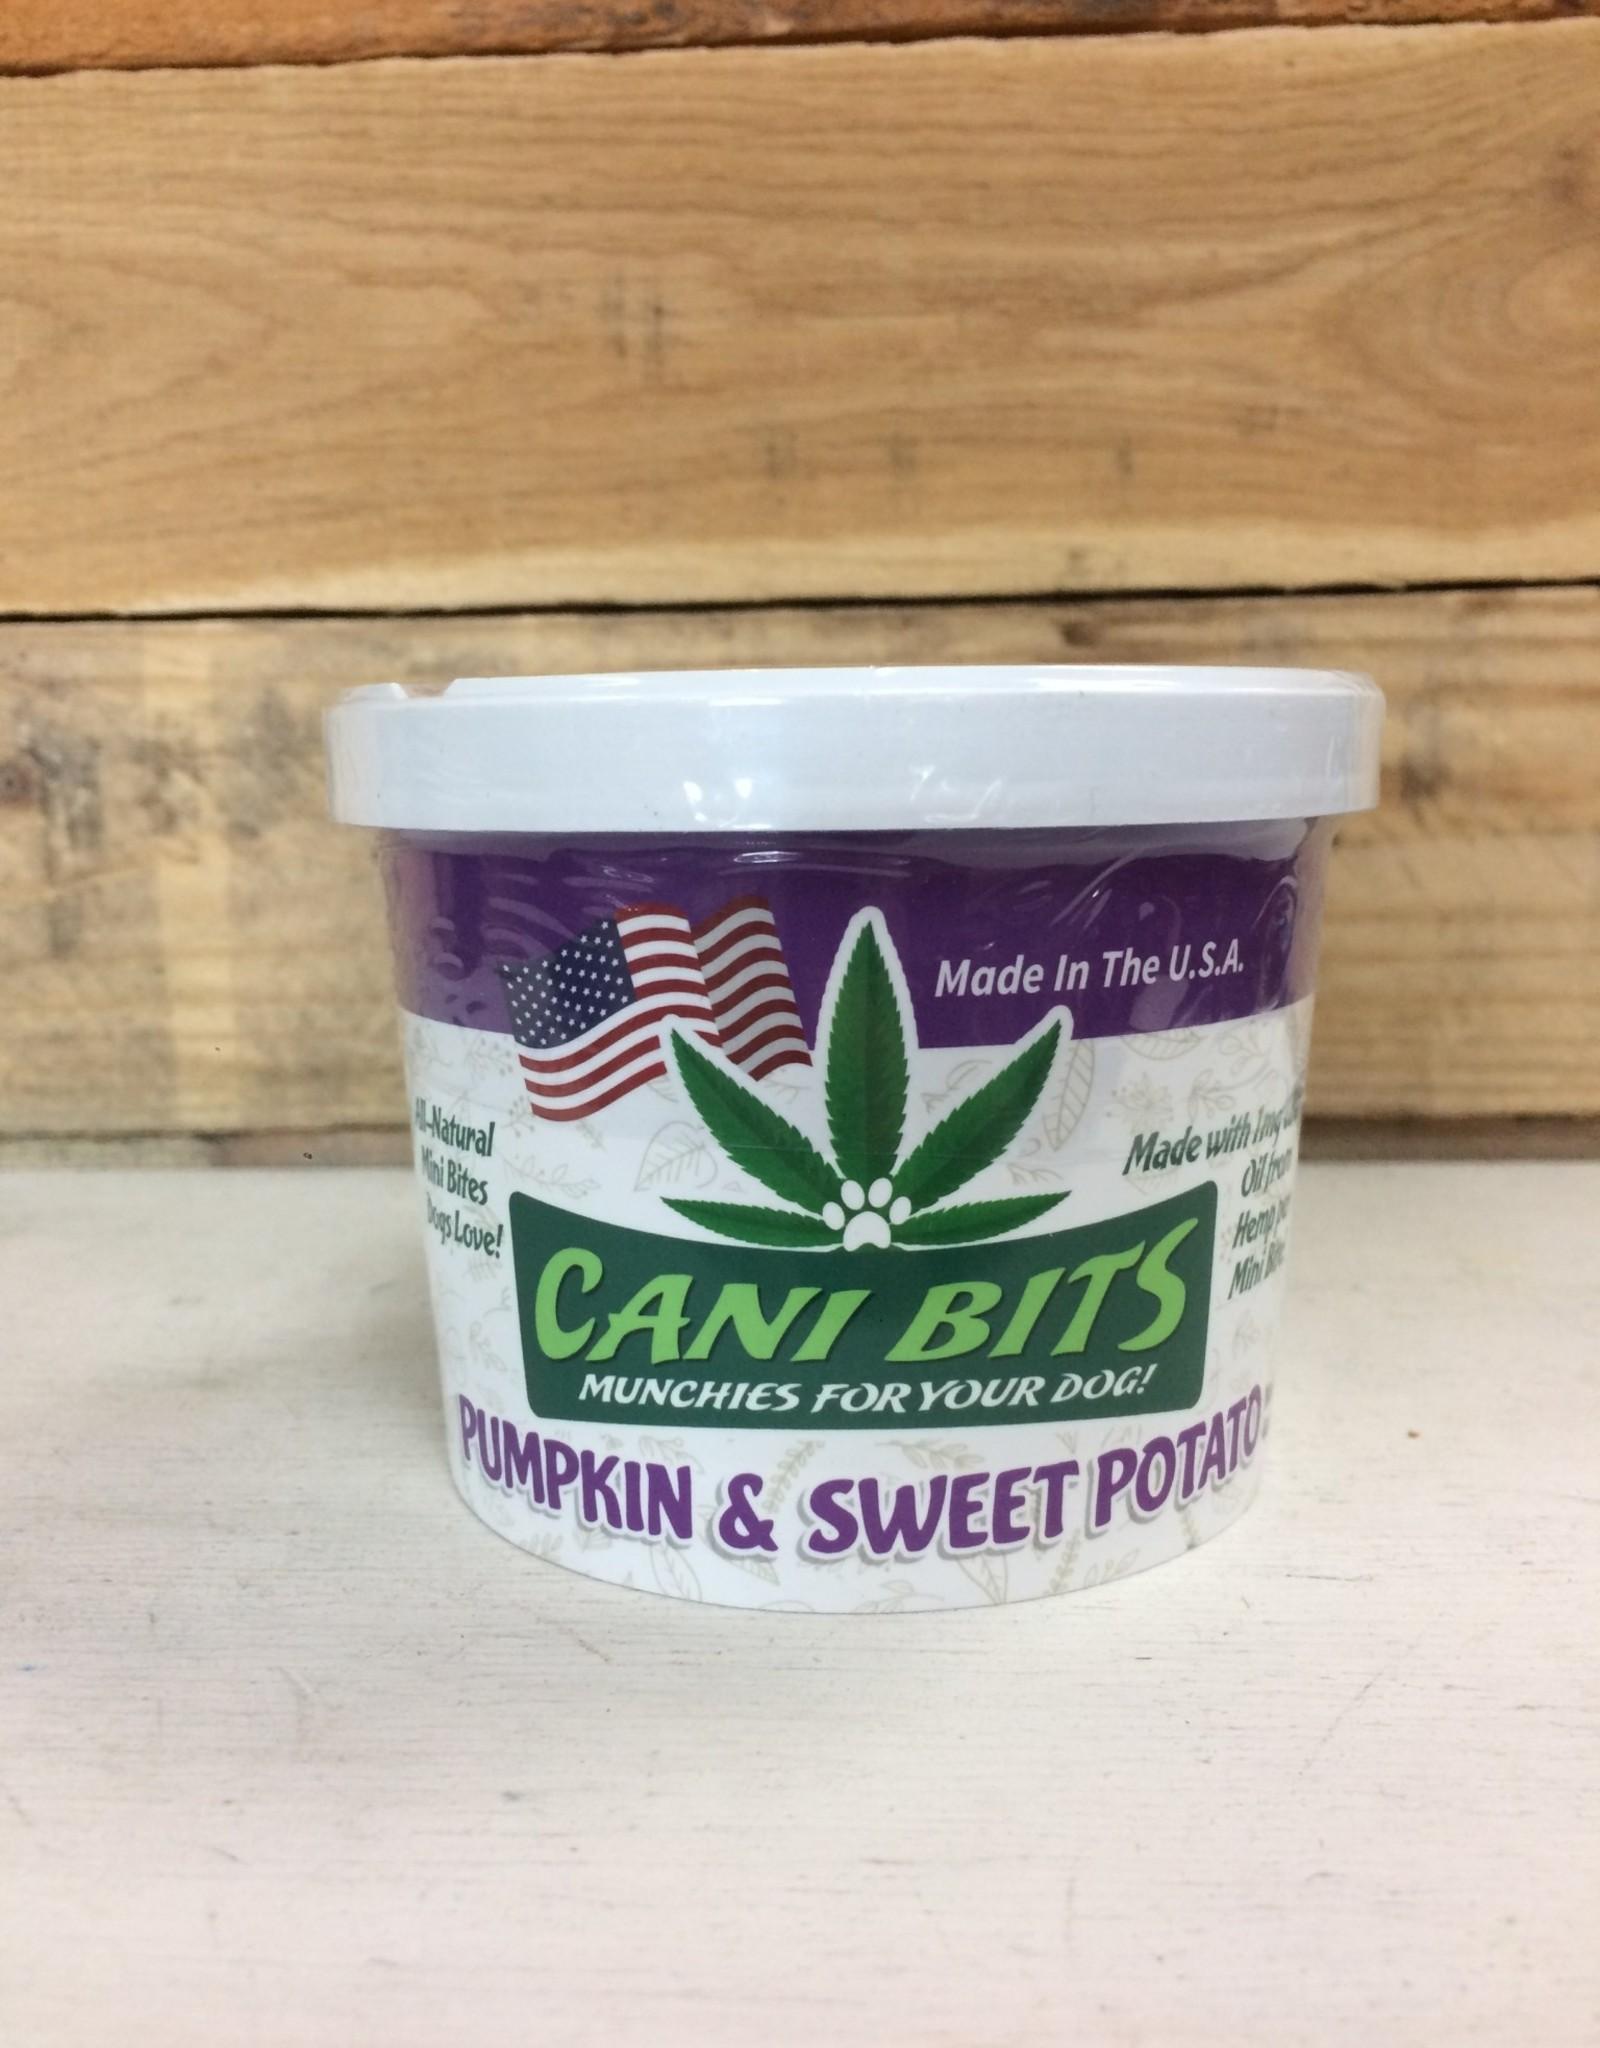 Cani Bits cani-bites pumpkin swt pot 4 oz